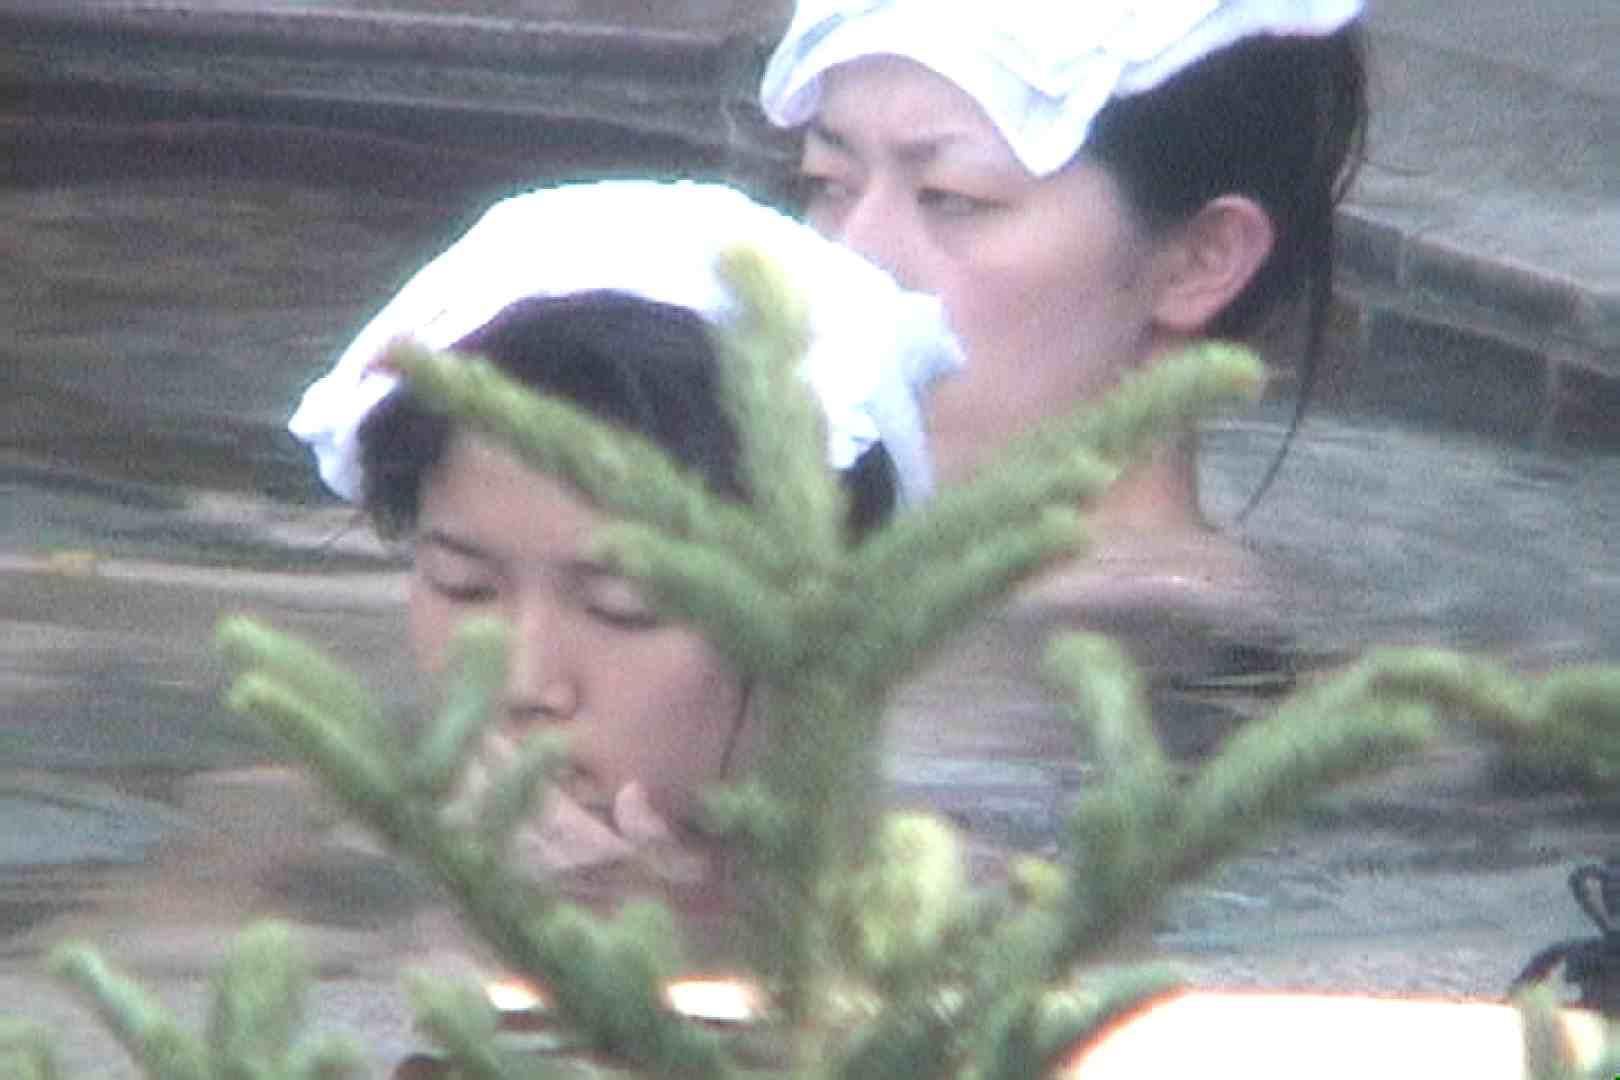 Aquaな露天風呂Vol.80【VIP限定】 盗撮 | HなOL  66pic 55